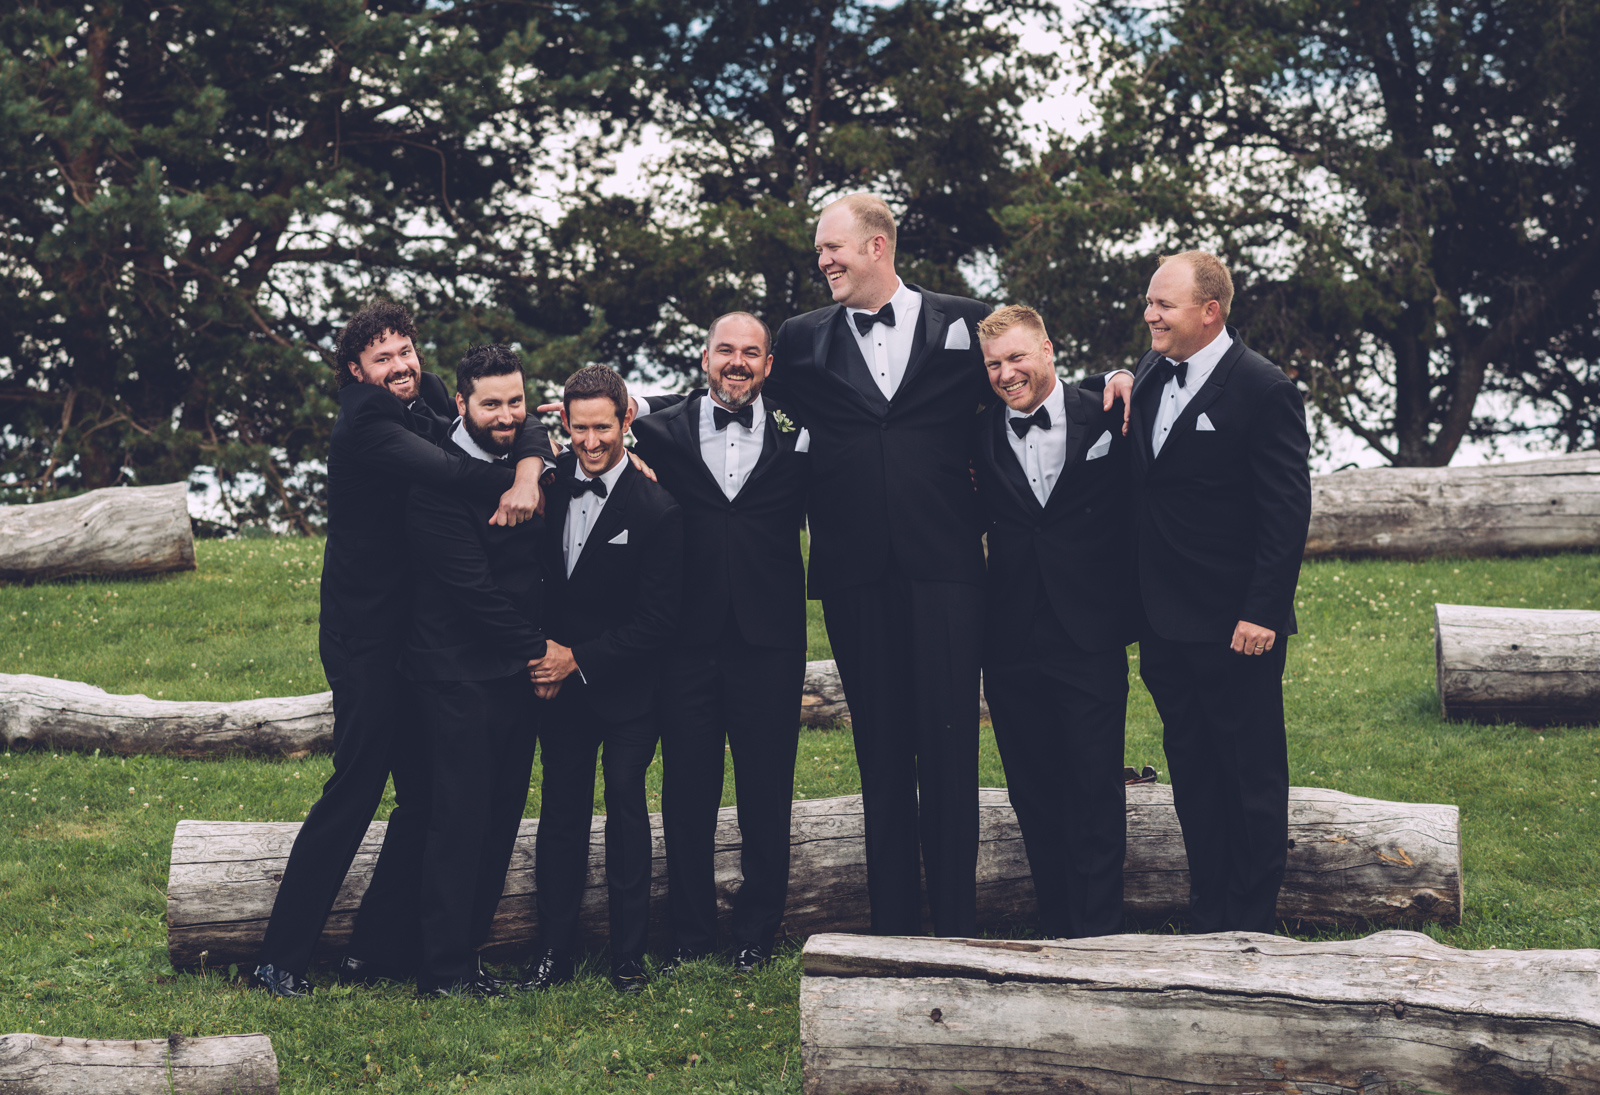 jessica_jonathon_wedding_blog61.jpg